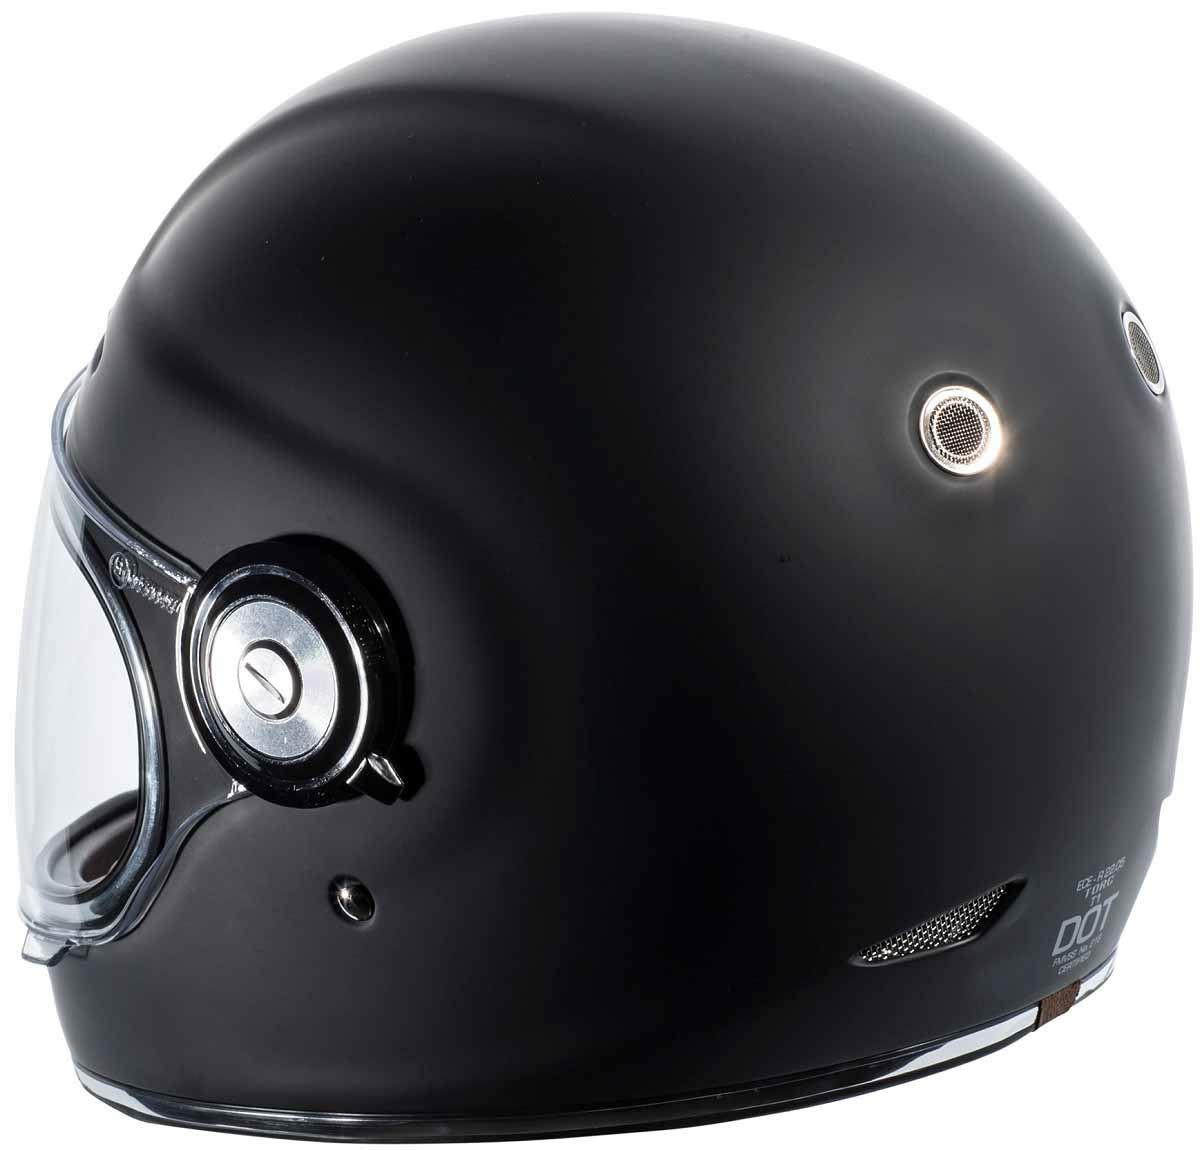 miniature 4 - Torc T1 Helmet Retro Vintage Style Fiberglass DOT Approved XS-2XL